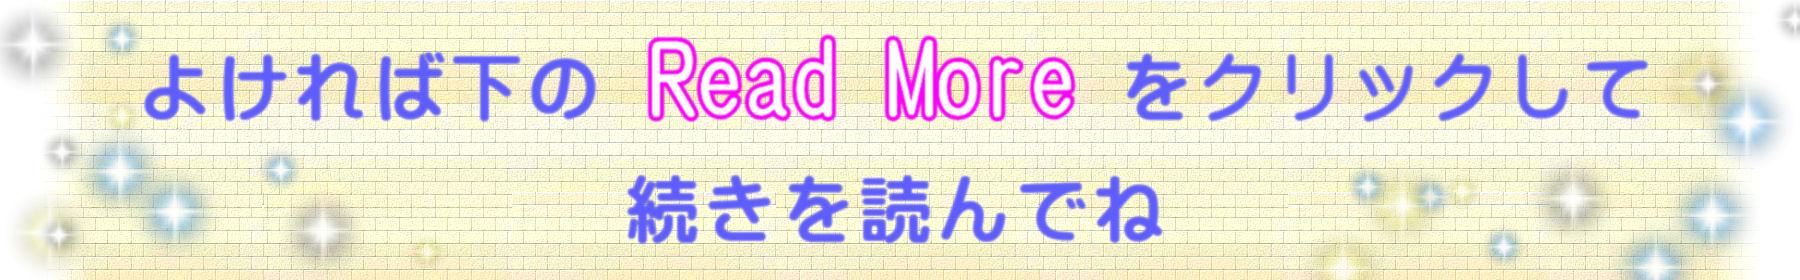 showMore メッセージ